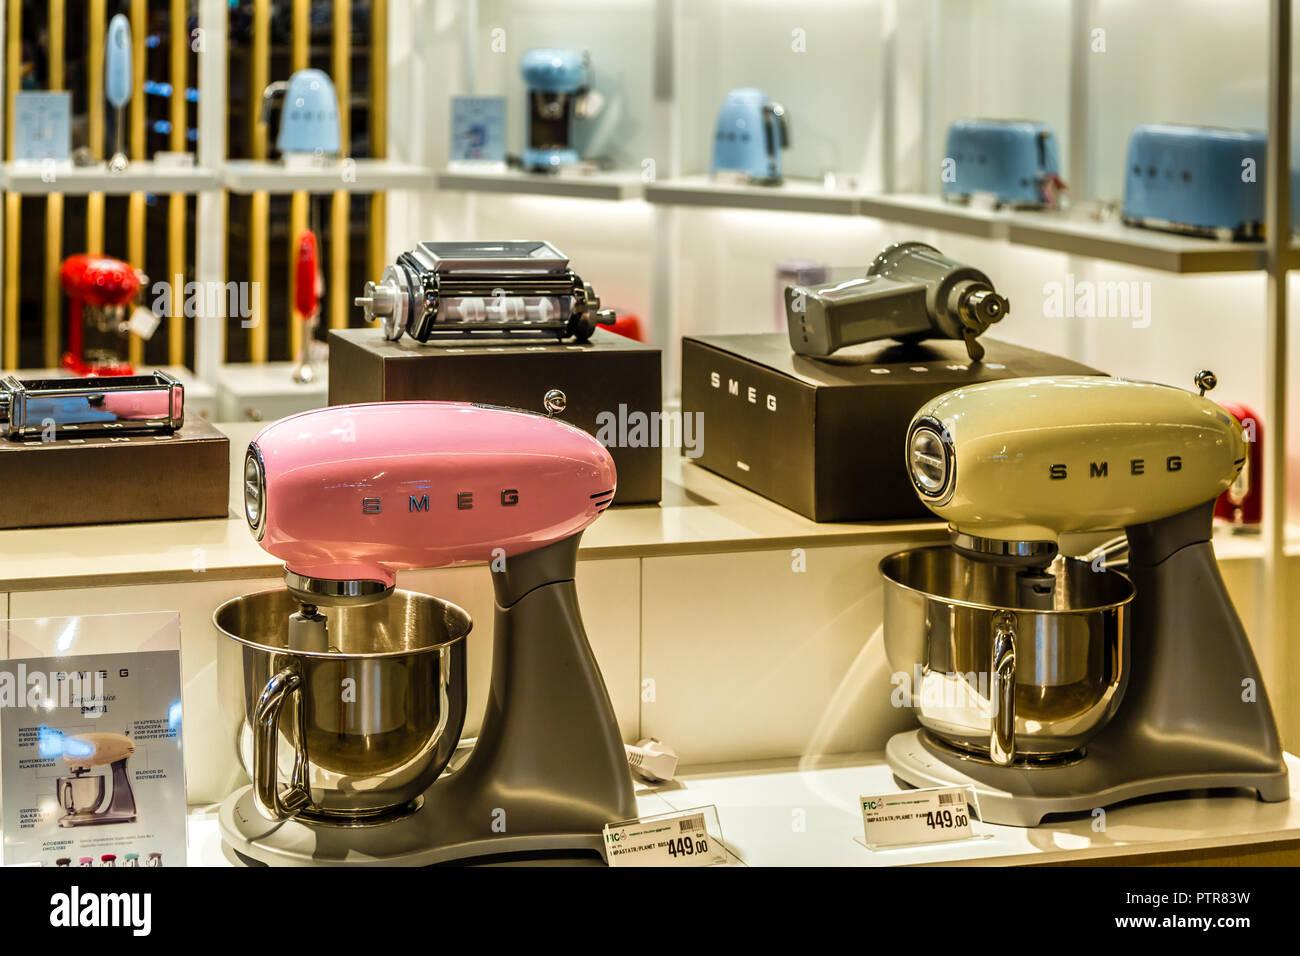 Smeg Kühlschrank Italia : Smeg stockfotos & smeg bilder seite 2 alamy